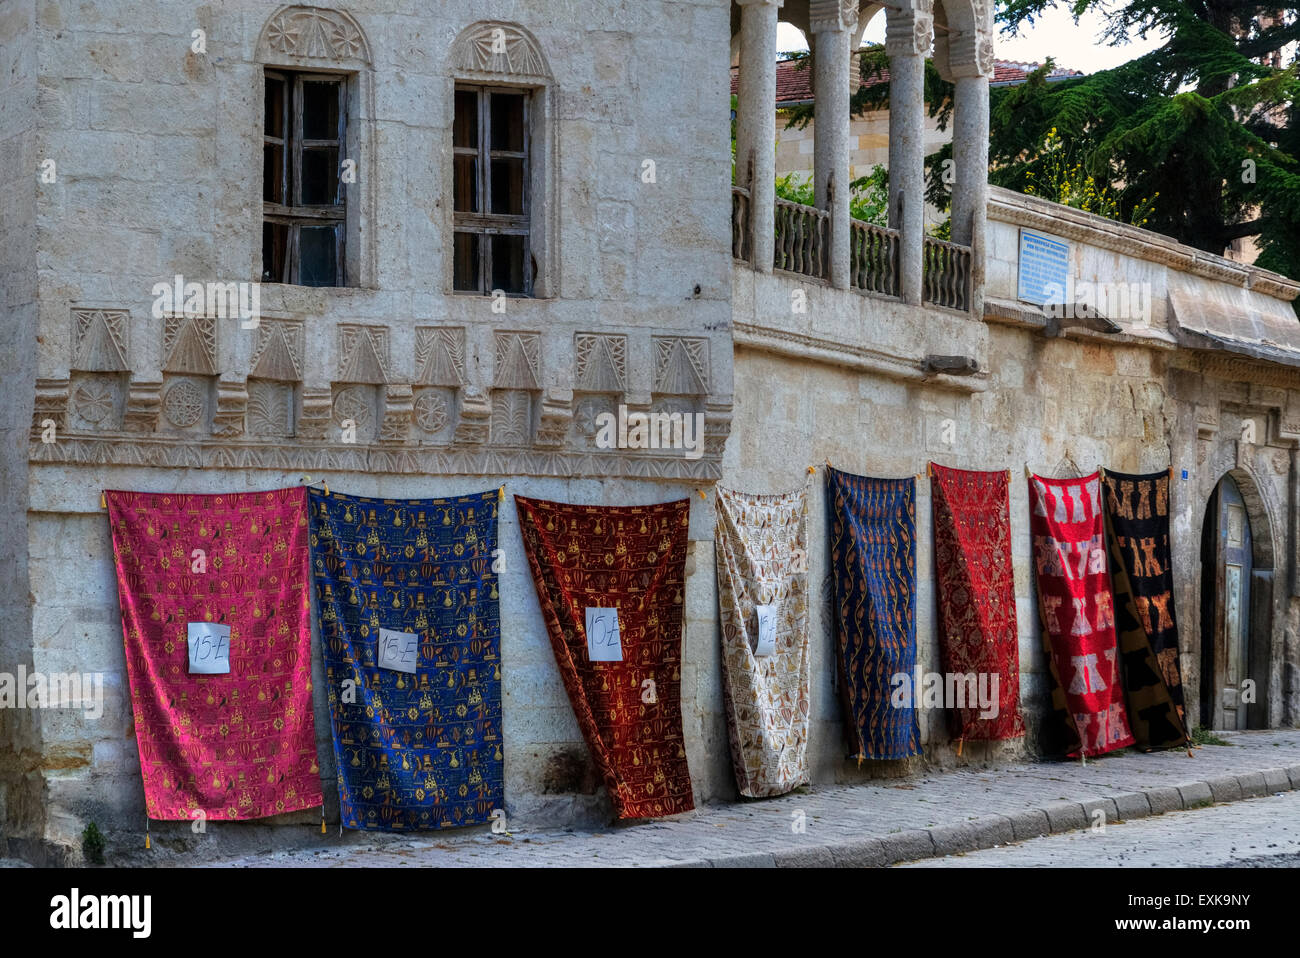 Turkish carpet shop in Mustafapasa, Cappadocia, Anatolia, Turkey - Stock Image